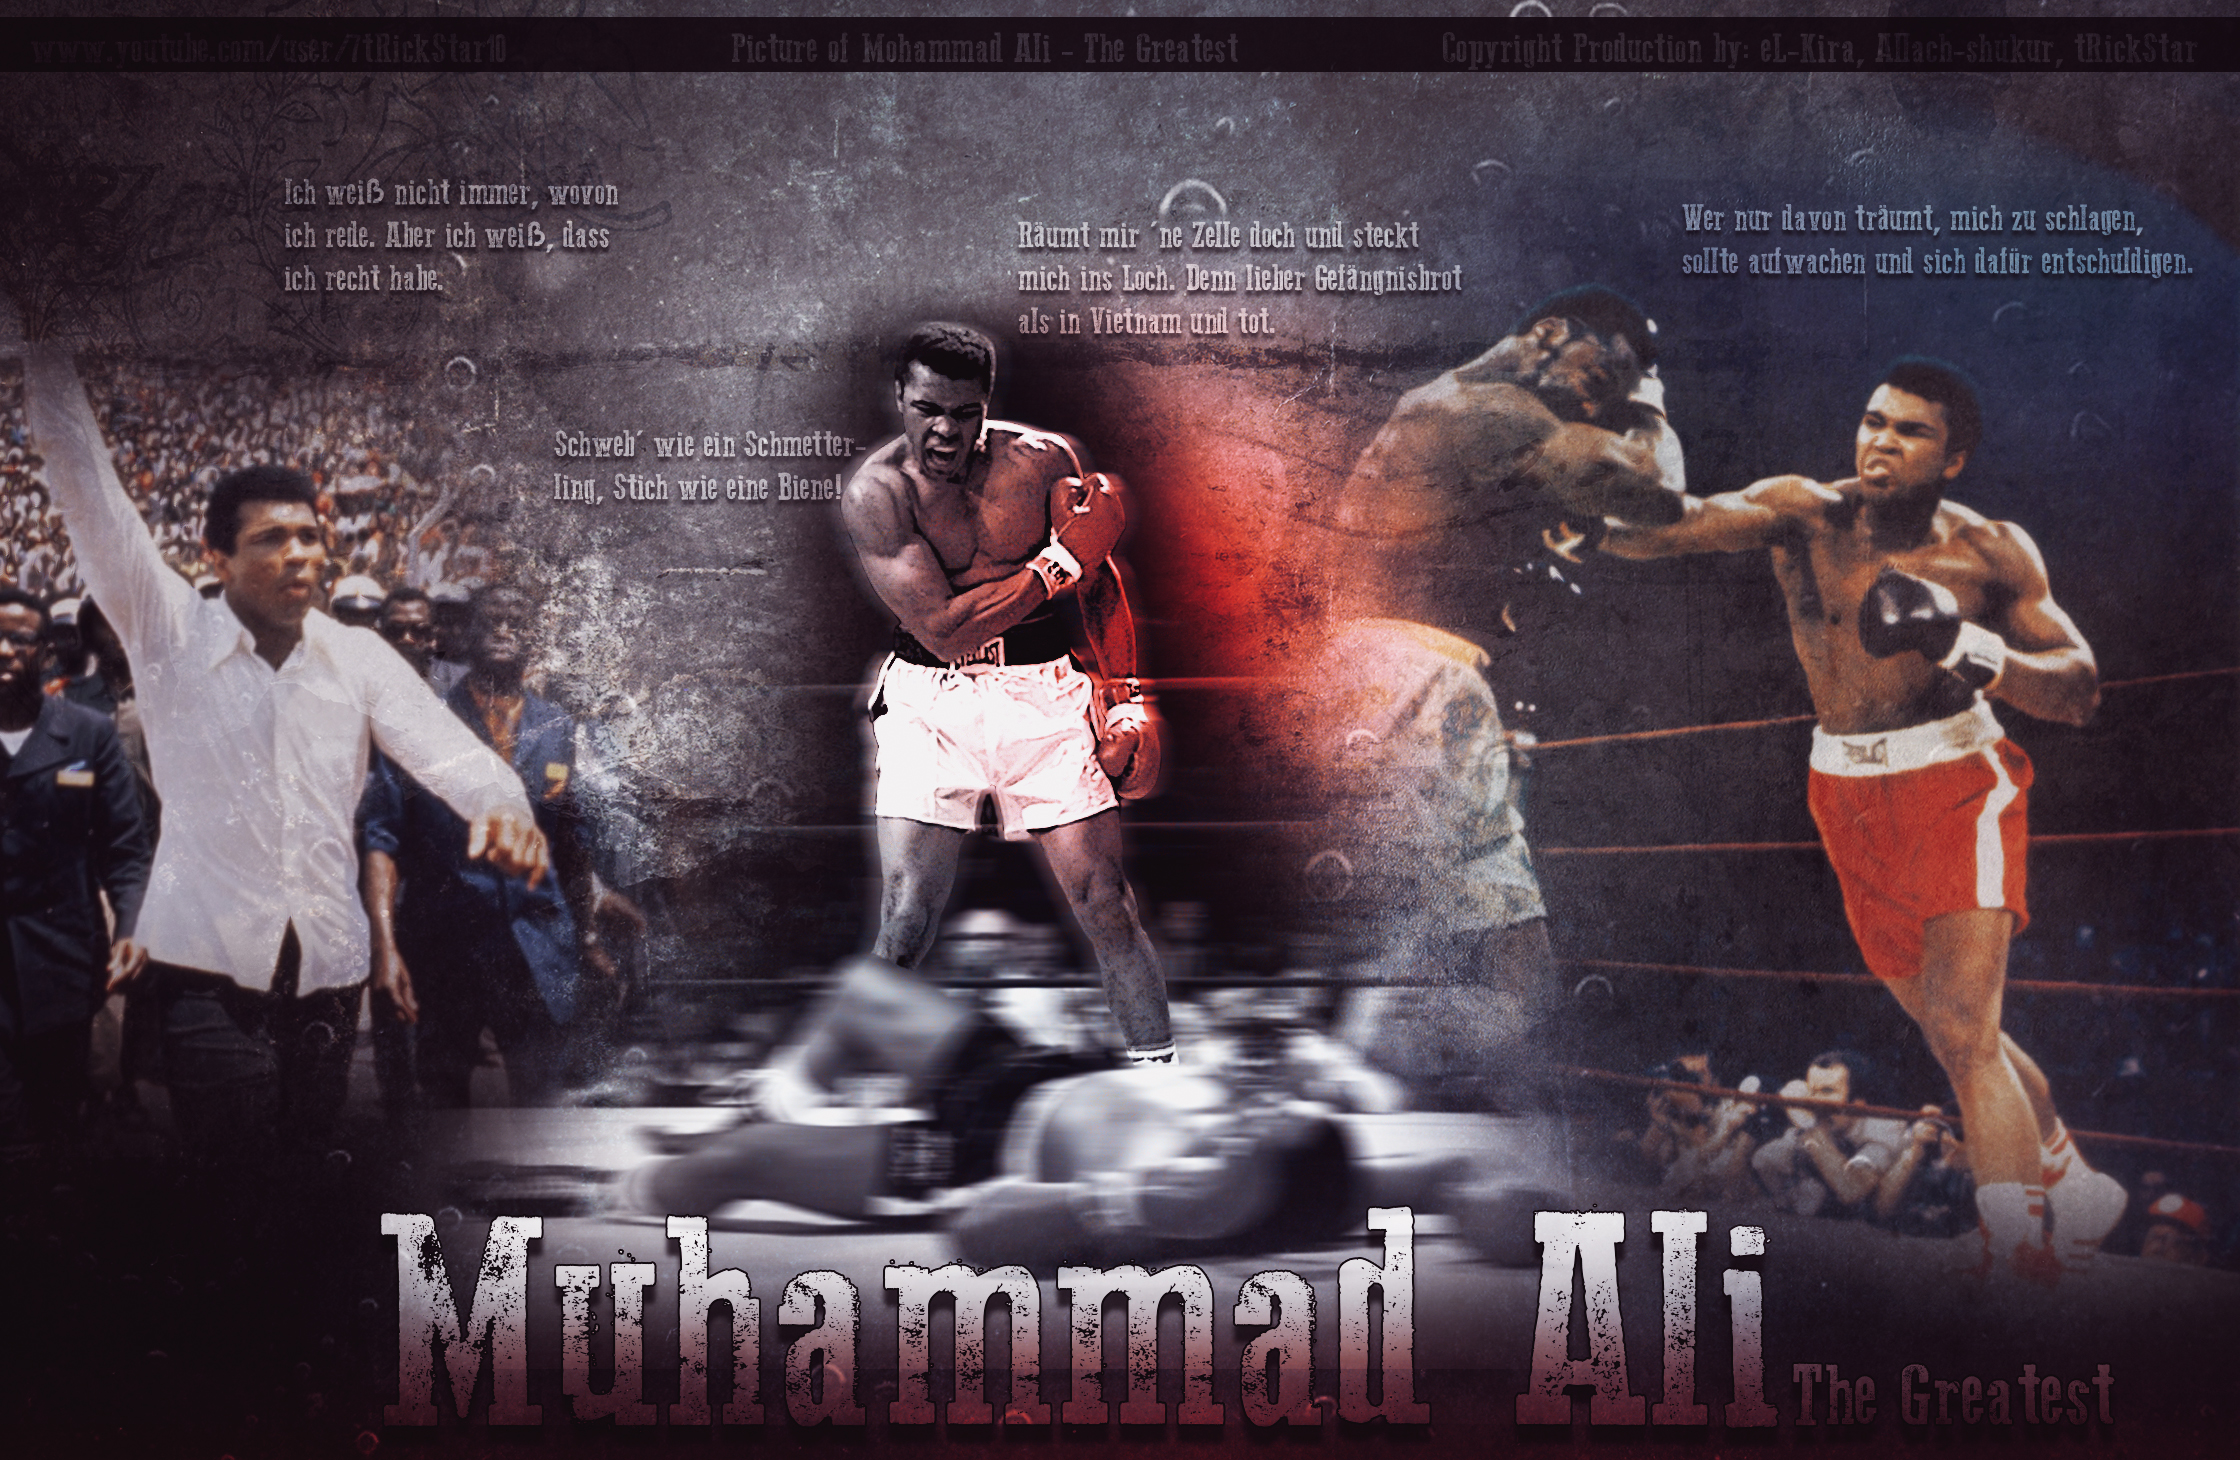 Muhammad Ali Wallpaper Images Crazy Gallery 2240x1460